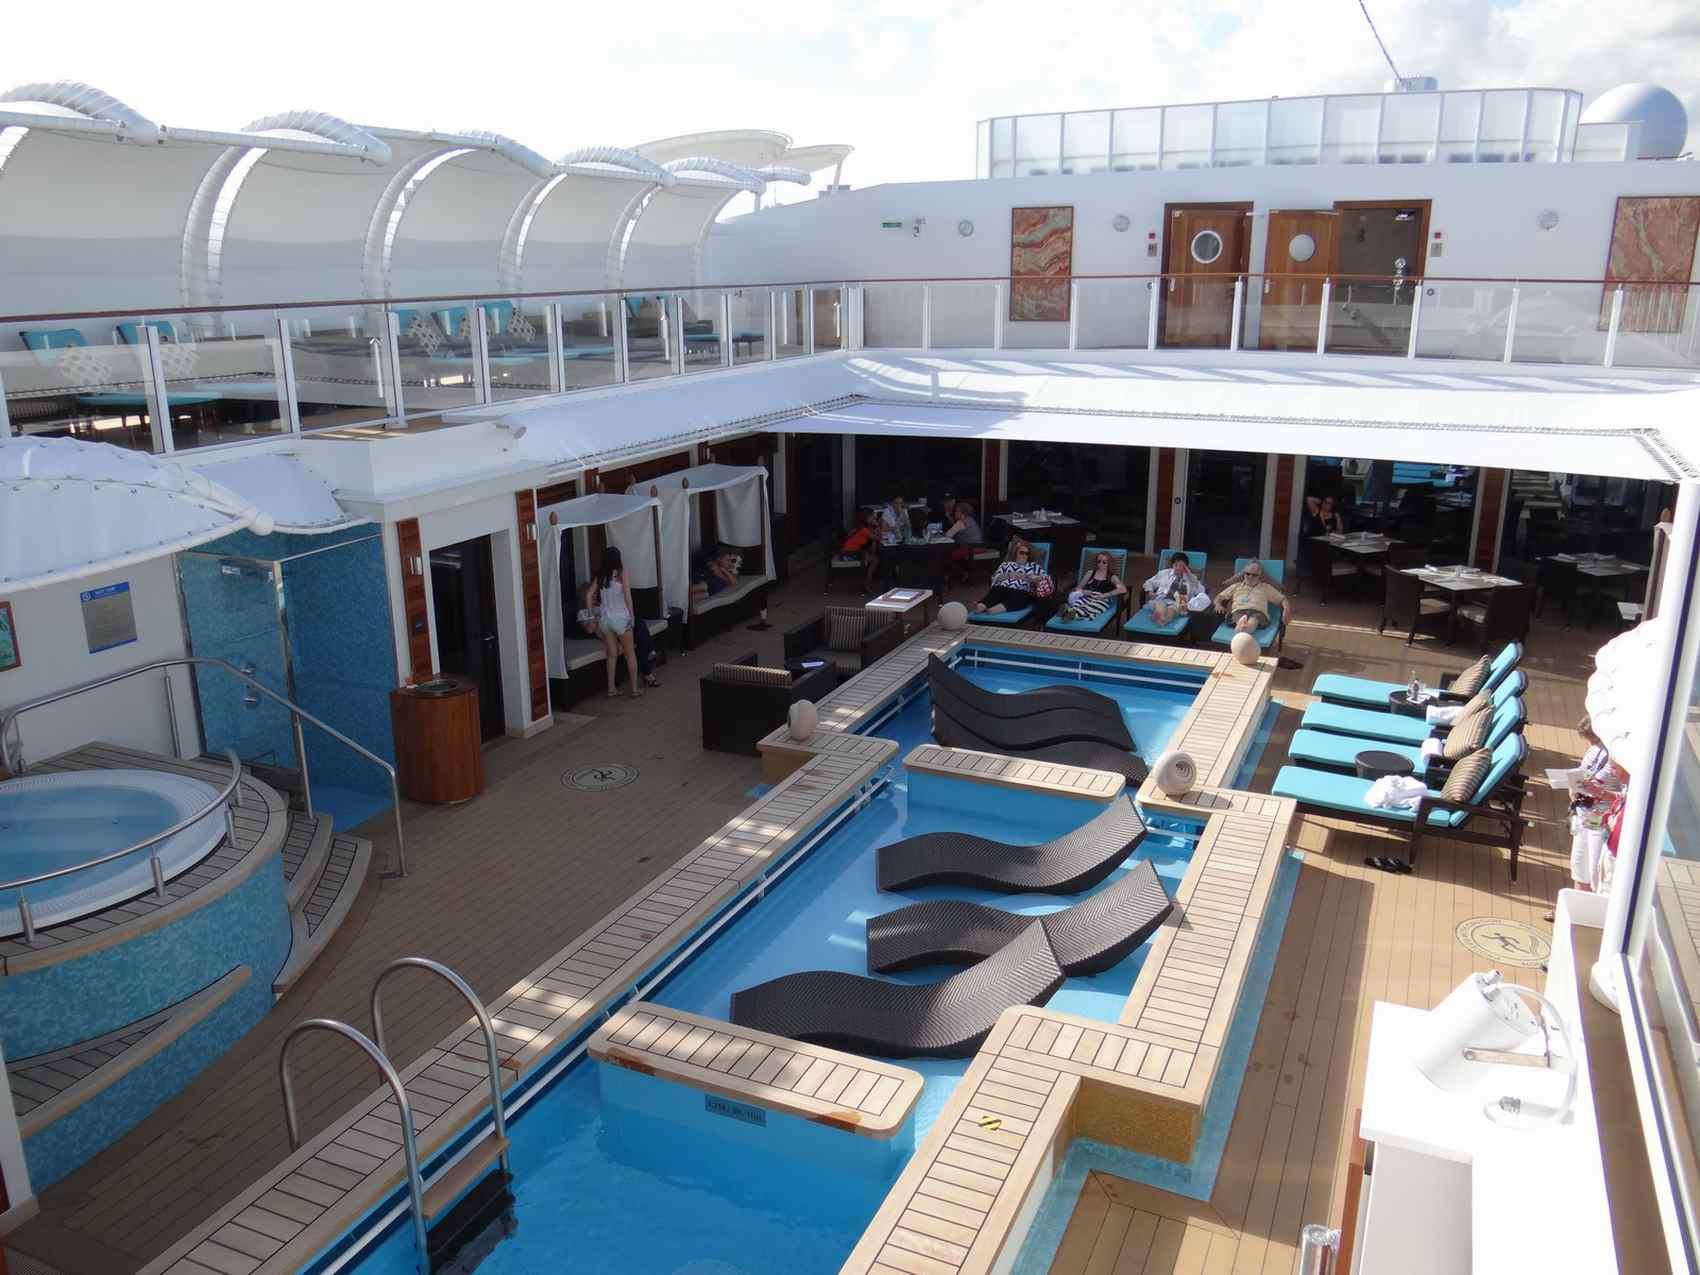 The Haven Courtyard on the Norwegian Getaway cruise ship